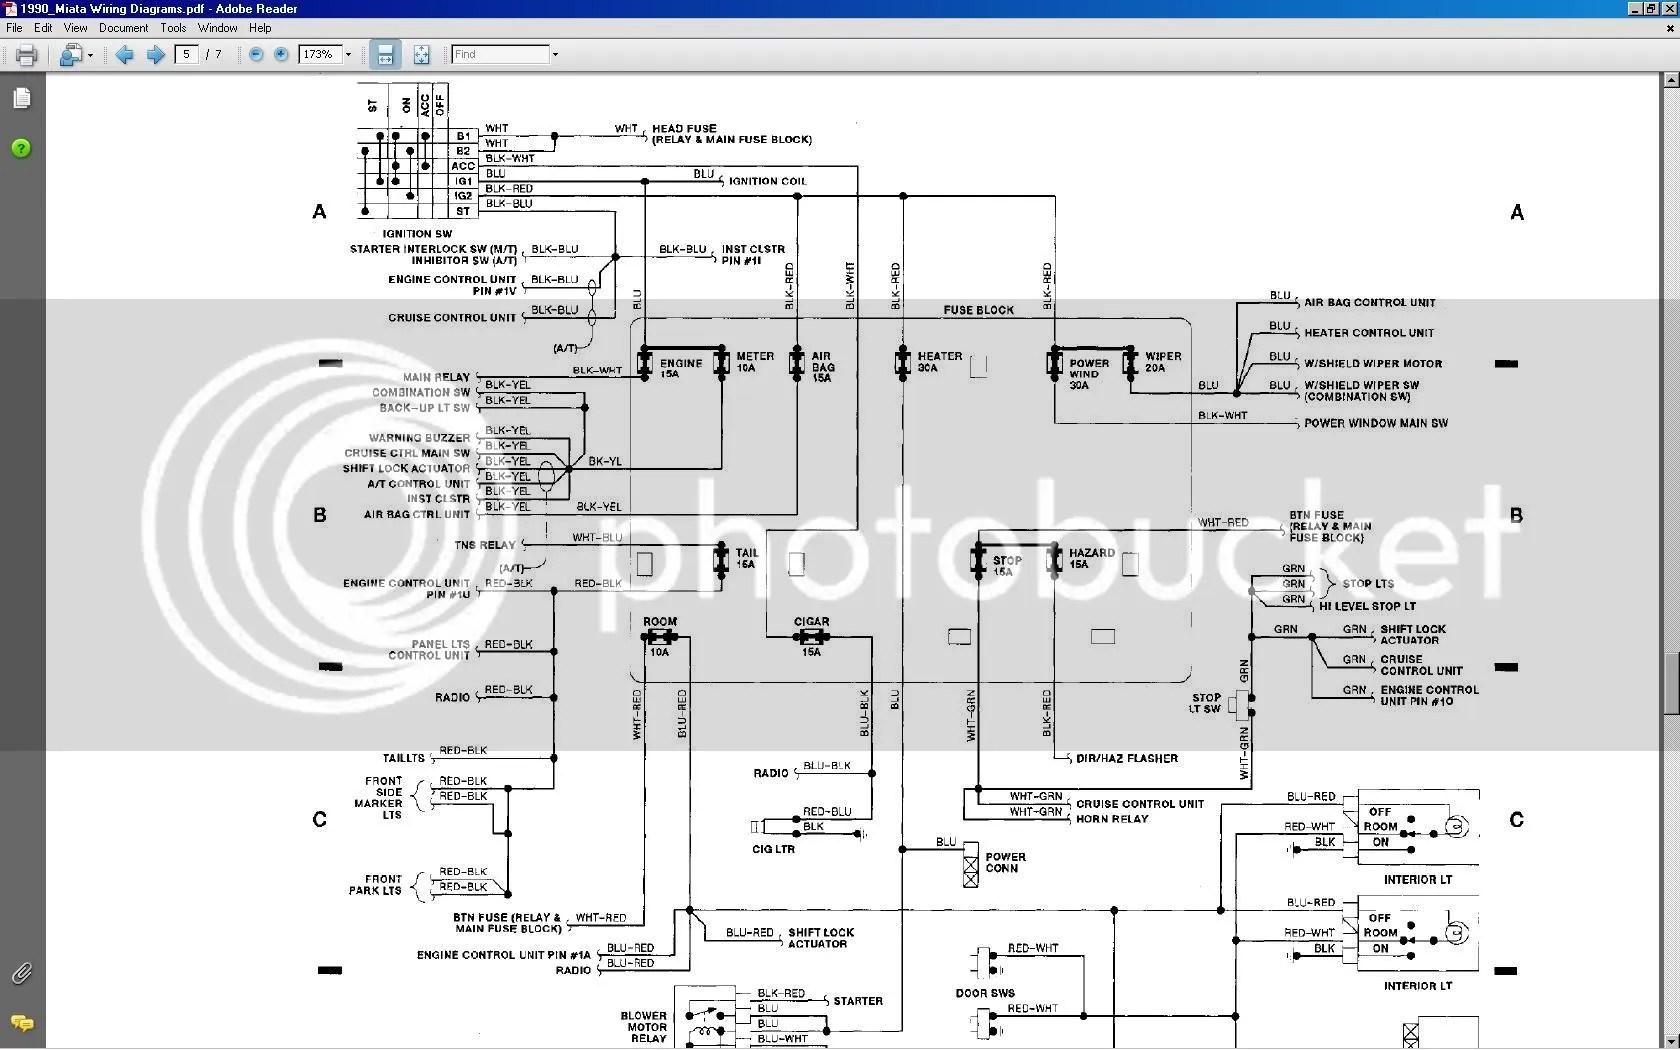 headlight motor wiring miata diagram receptacle mazda schematic mx5 lenght manual e